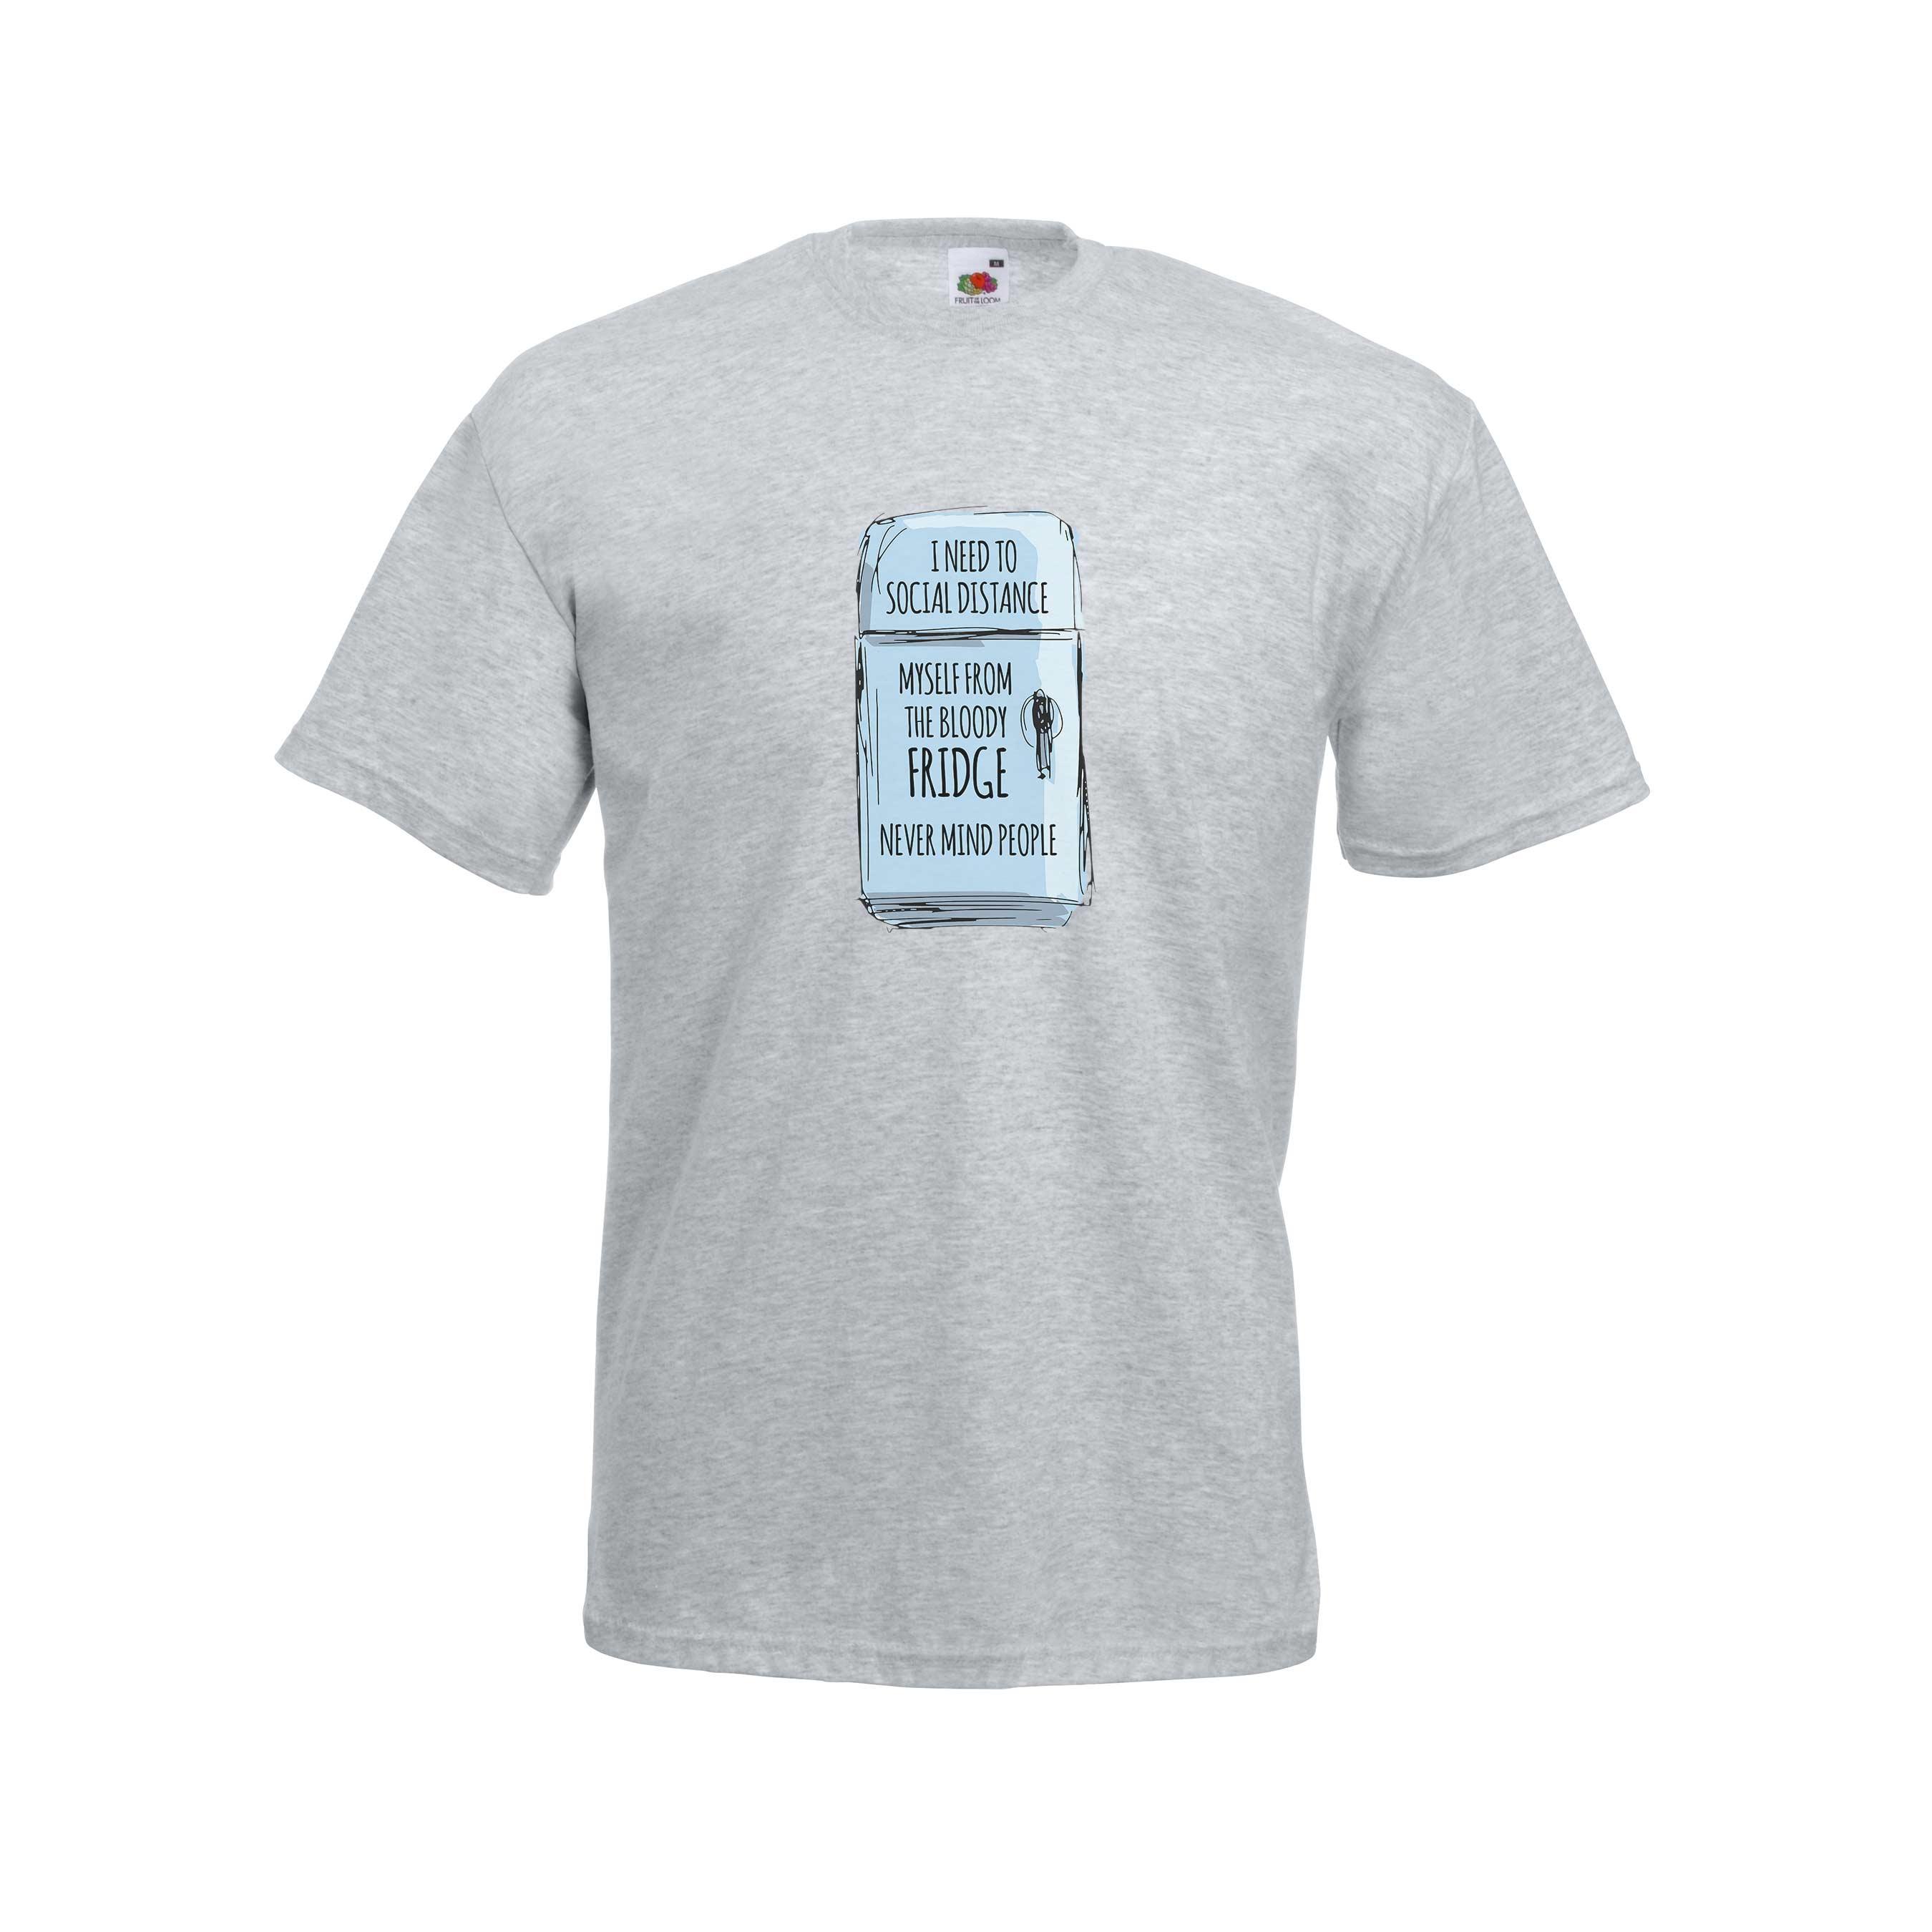 Fridge design for t-shirt, hoodie & sweatshirt